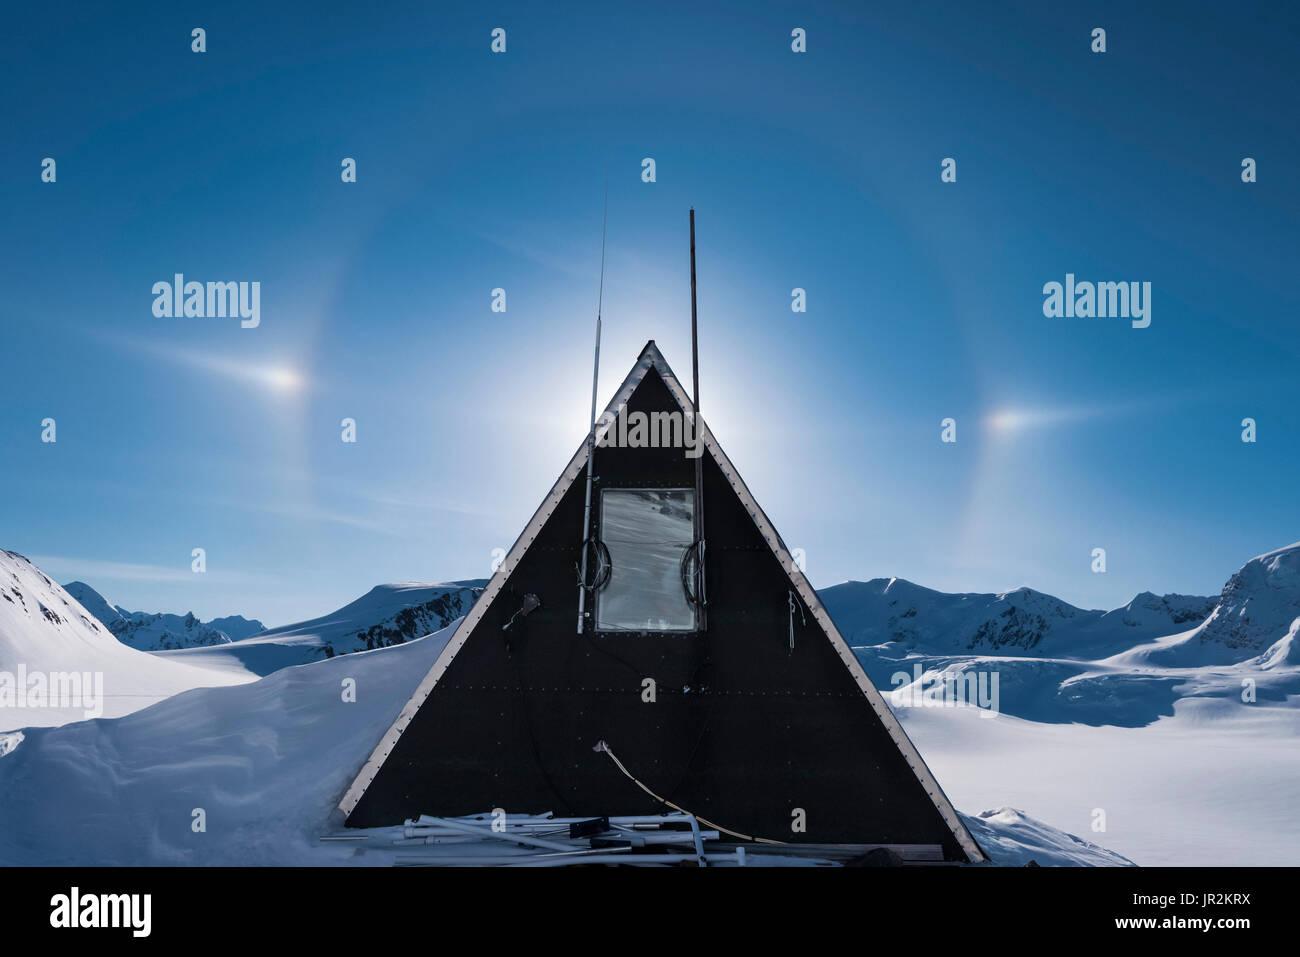 Sundog Frames The Pointed Peak Of A Usgs Gulkana Glacier Research Hut, Interior Alaska, USA - Stock Image